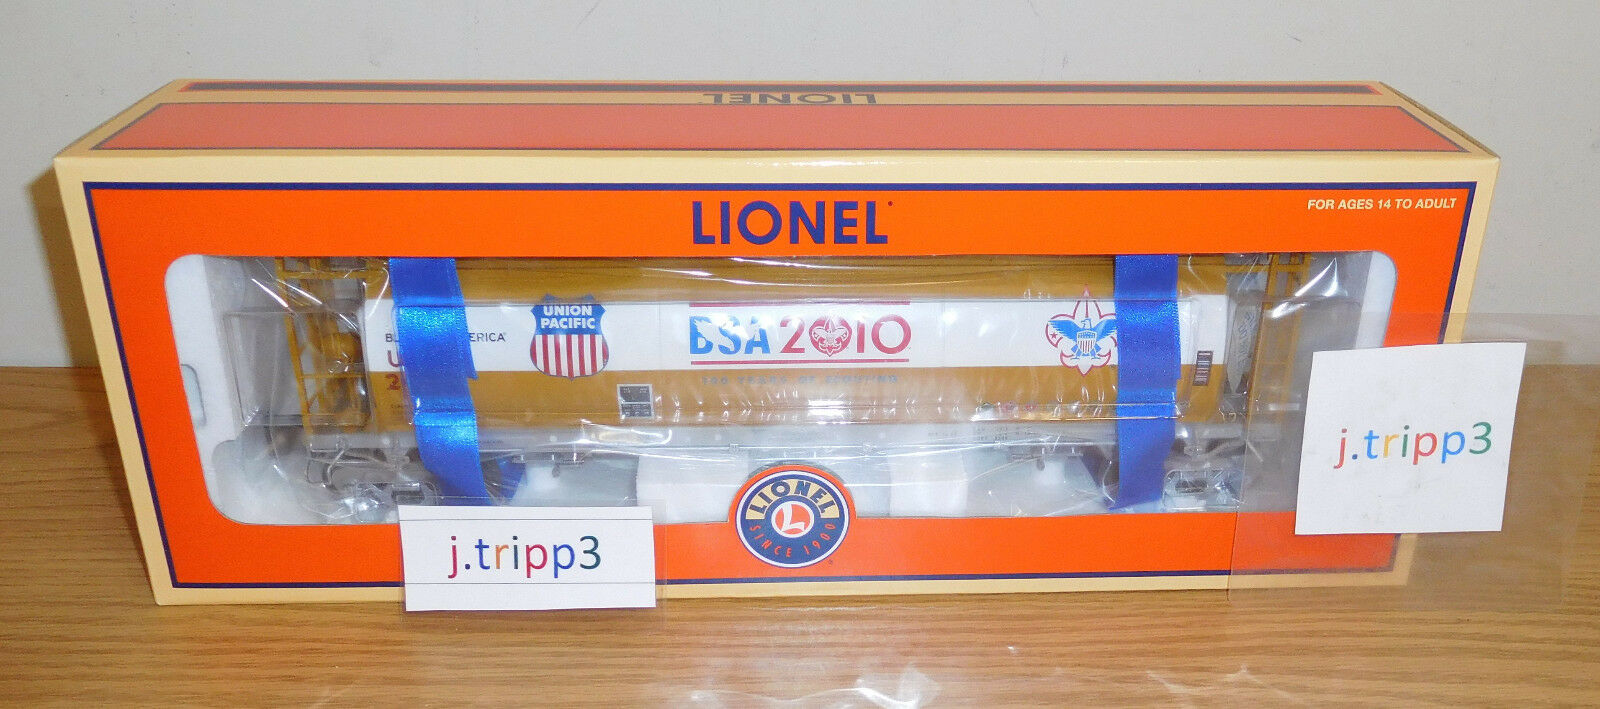 Lionel 27449 Boy Scouts BSA Tolva cilíndrica tren escala de América Union Pacific